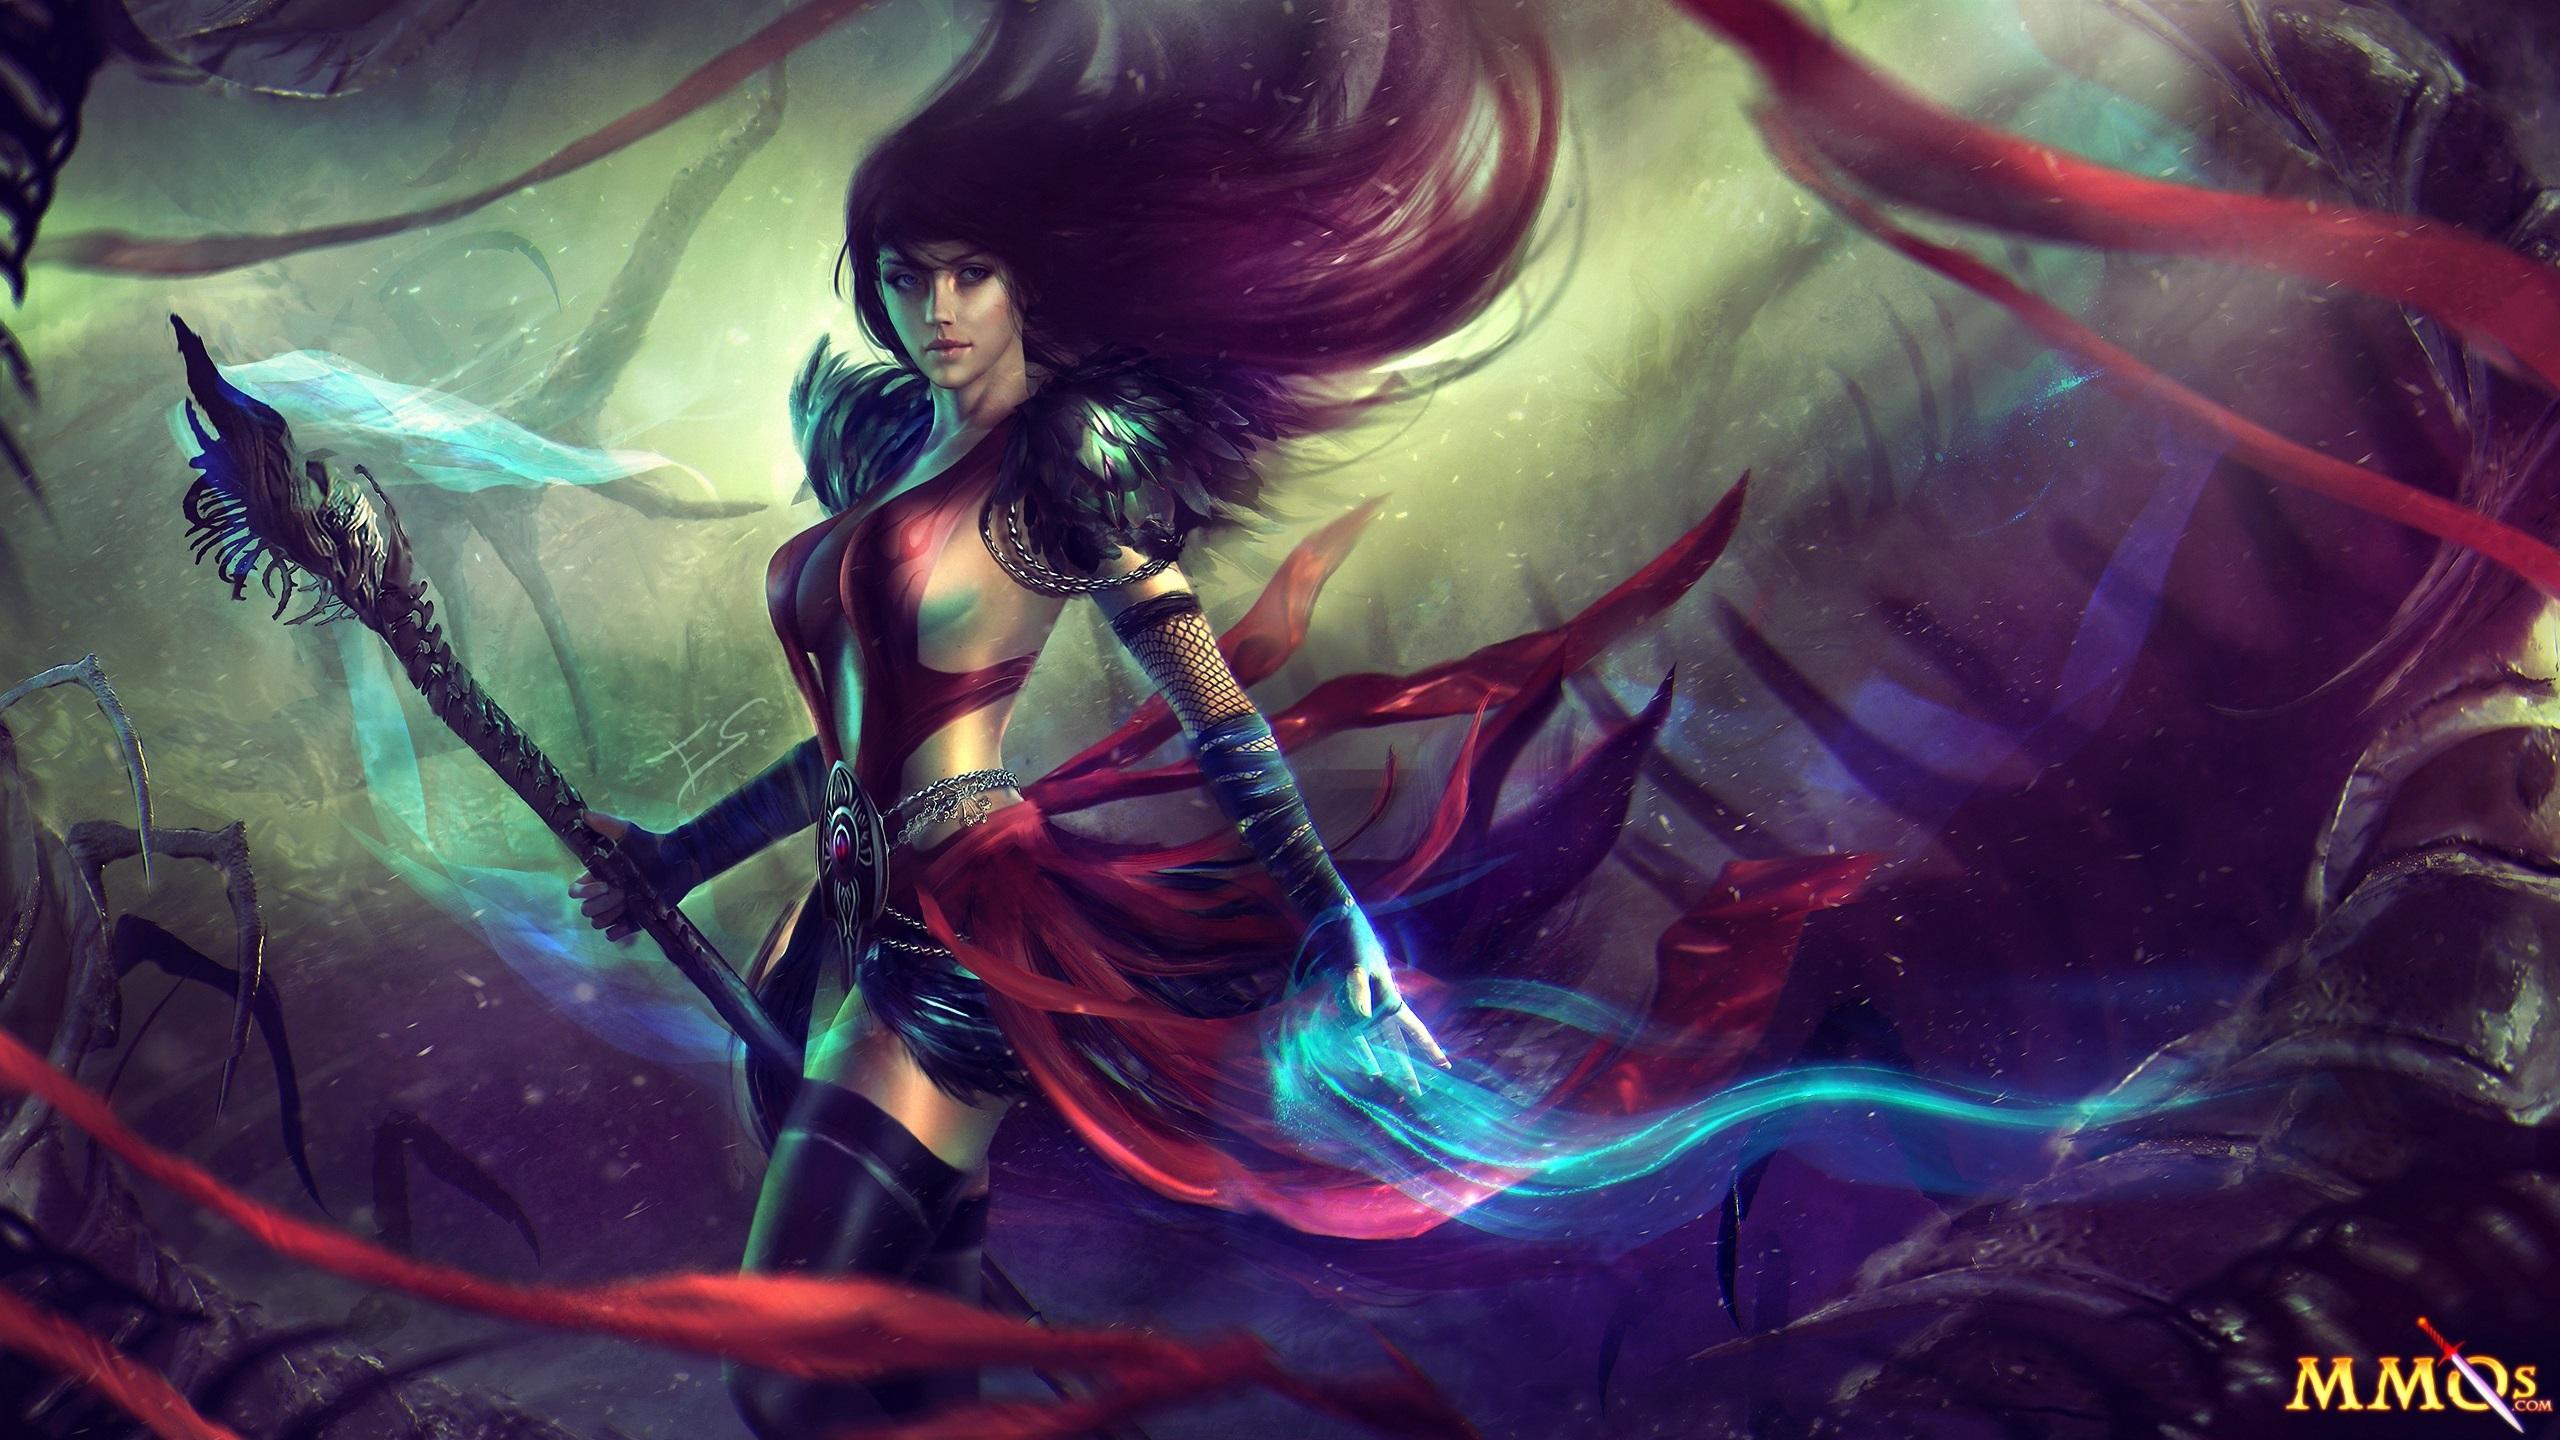 Wallpaper Guild Wars 2 Beautiful Girl Magic 2560x1440 Qhd